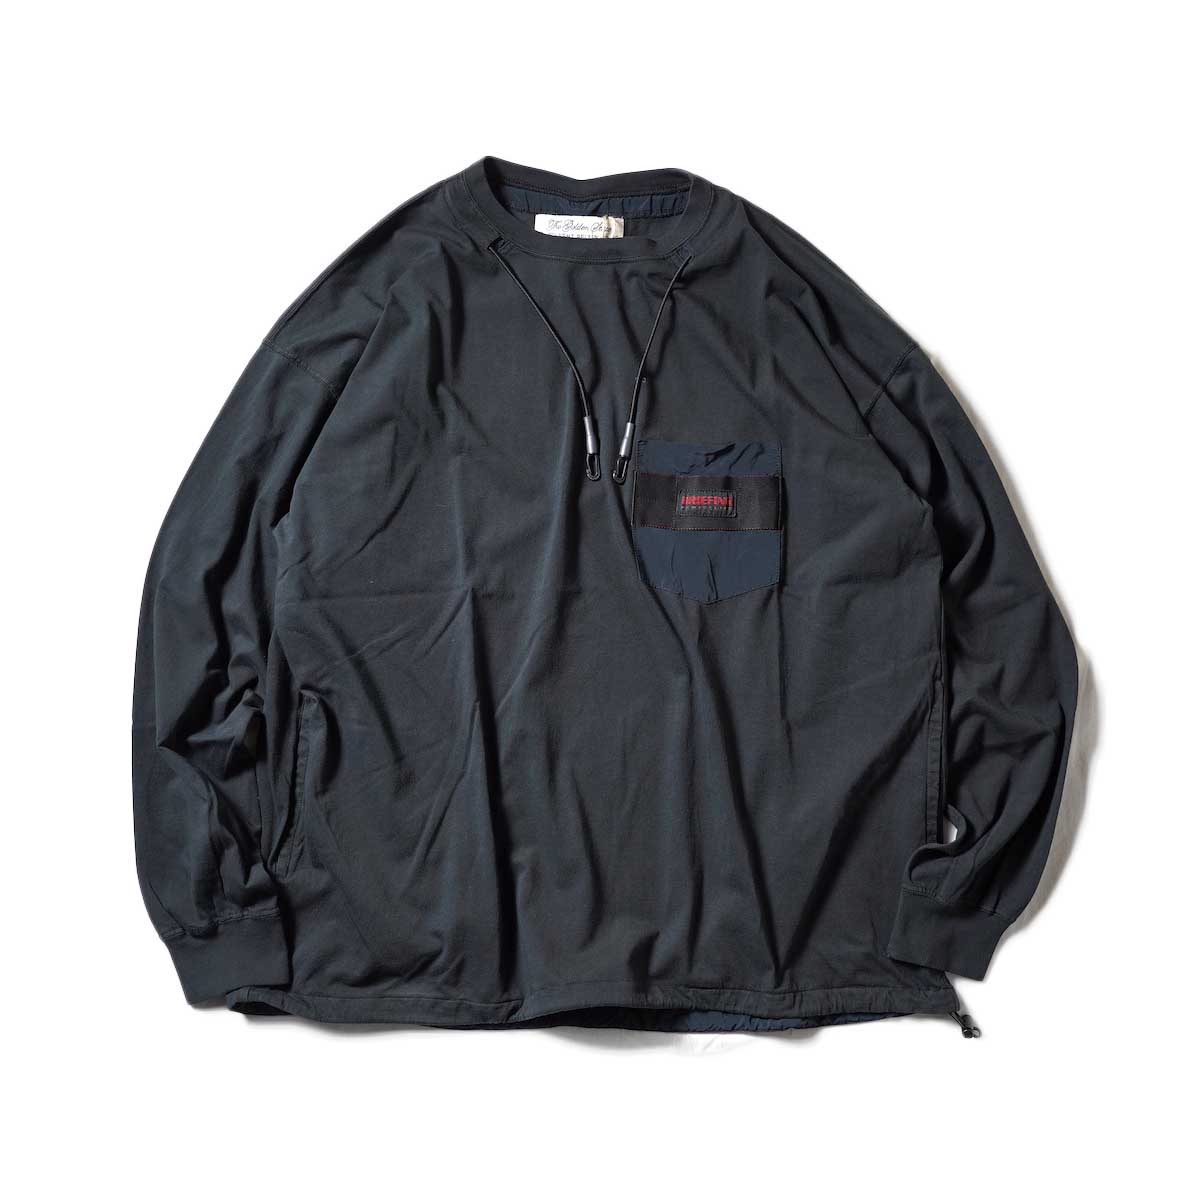 REMI RELIEF / BRFストラップ付30天竺ロンT (Black)